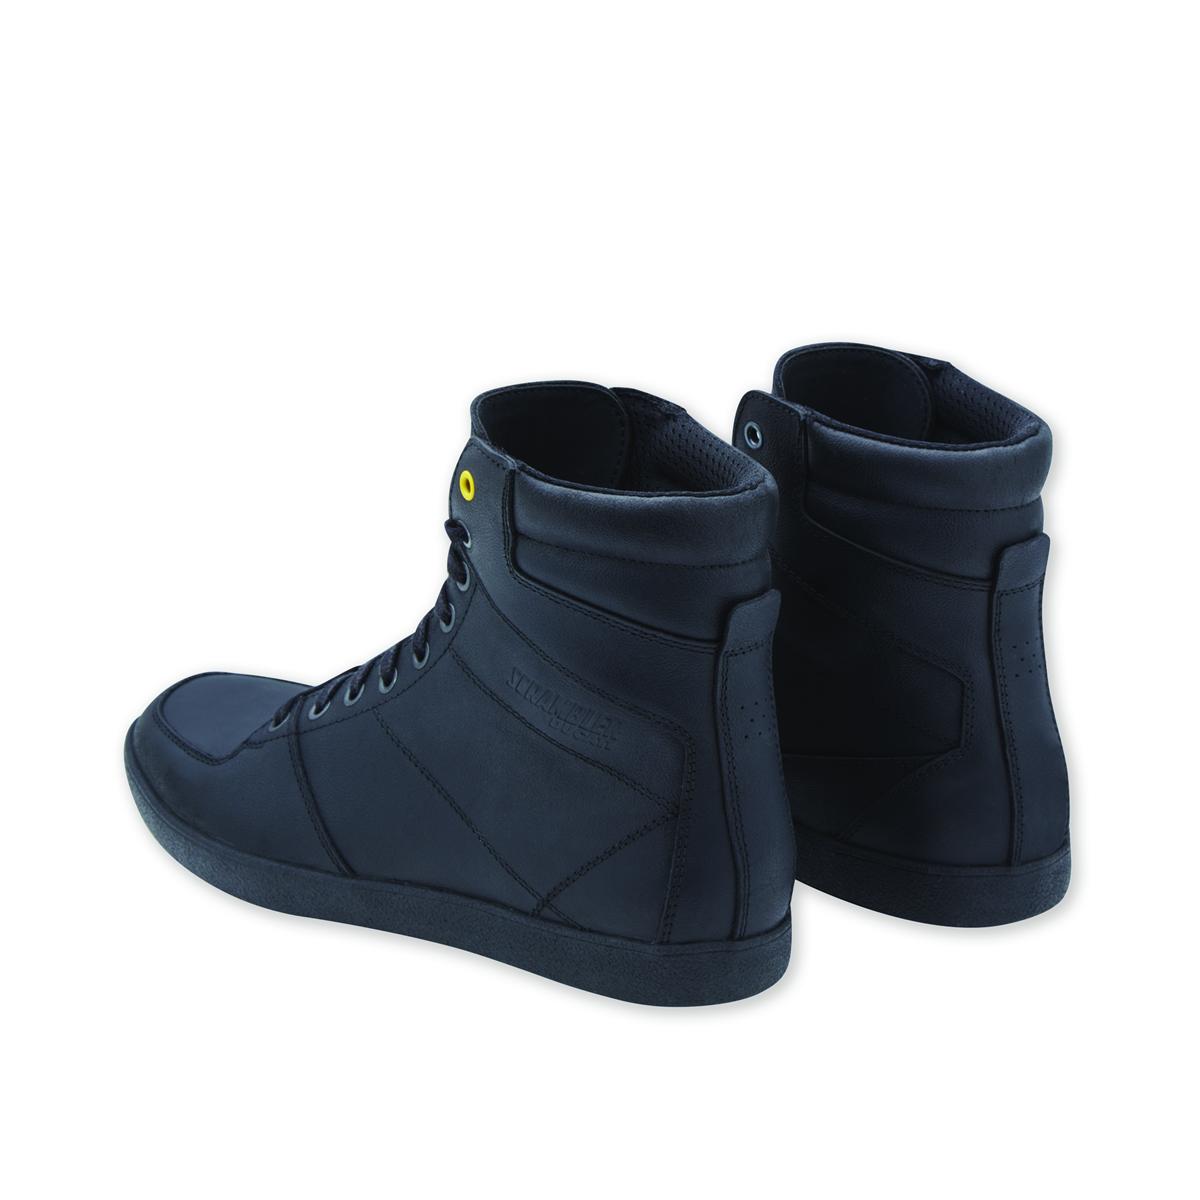 Black Rider - Technical short boots